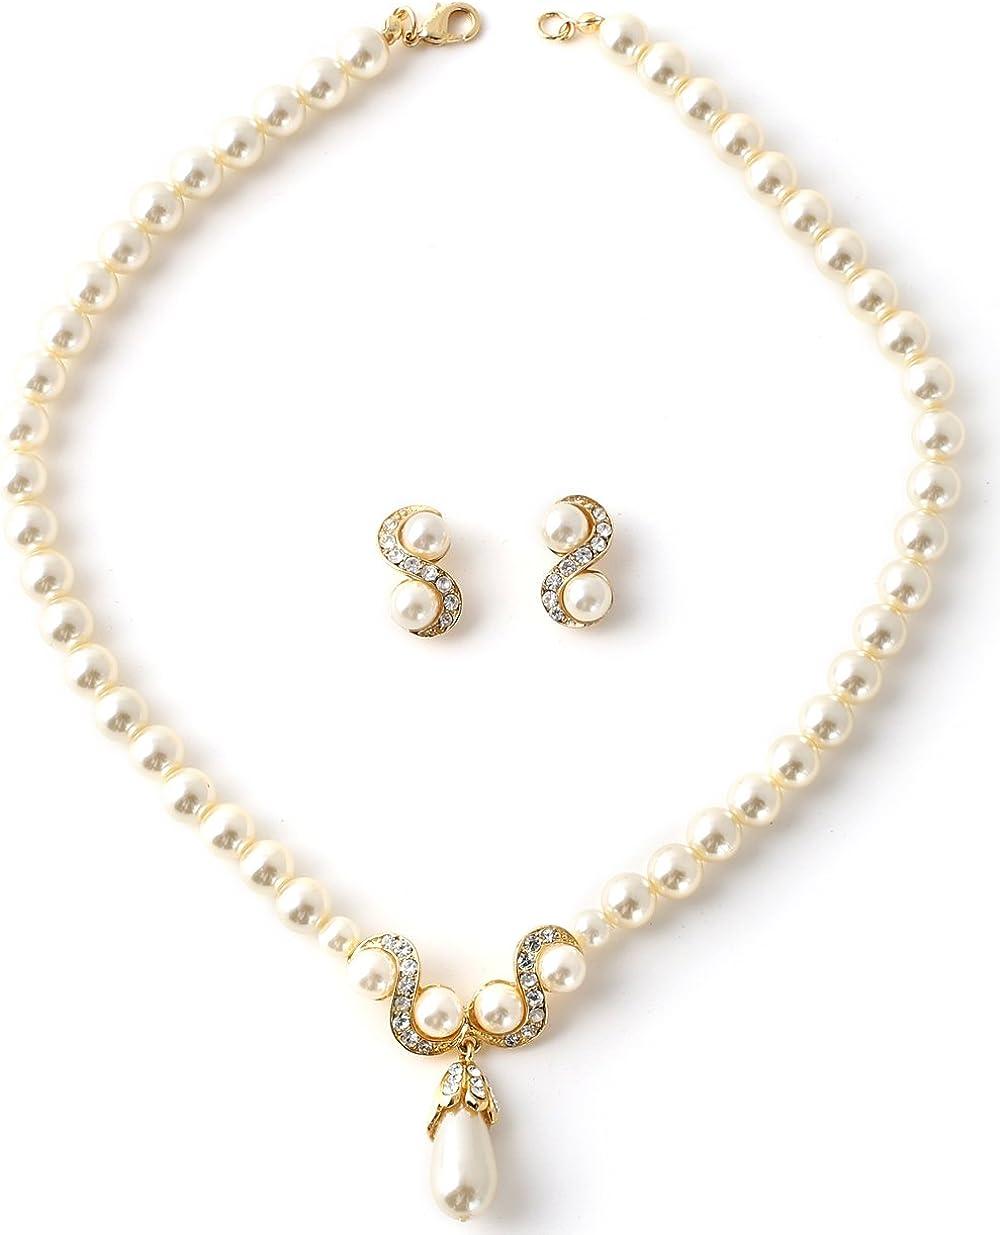 Topwholesalejewel Gold Cream Pearl Chain and Crystal Rhinestone with Dangle Cream Pearl Necklace and Crystal Rhinestone Swerve and Cream Pearl Earrings Jewelry Set